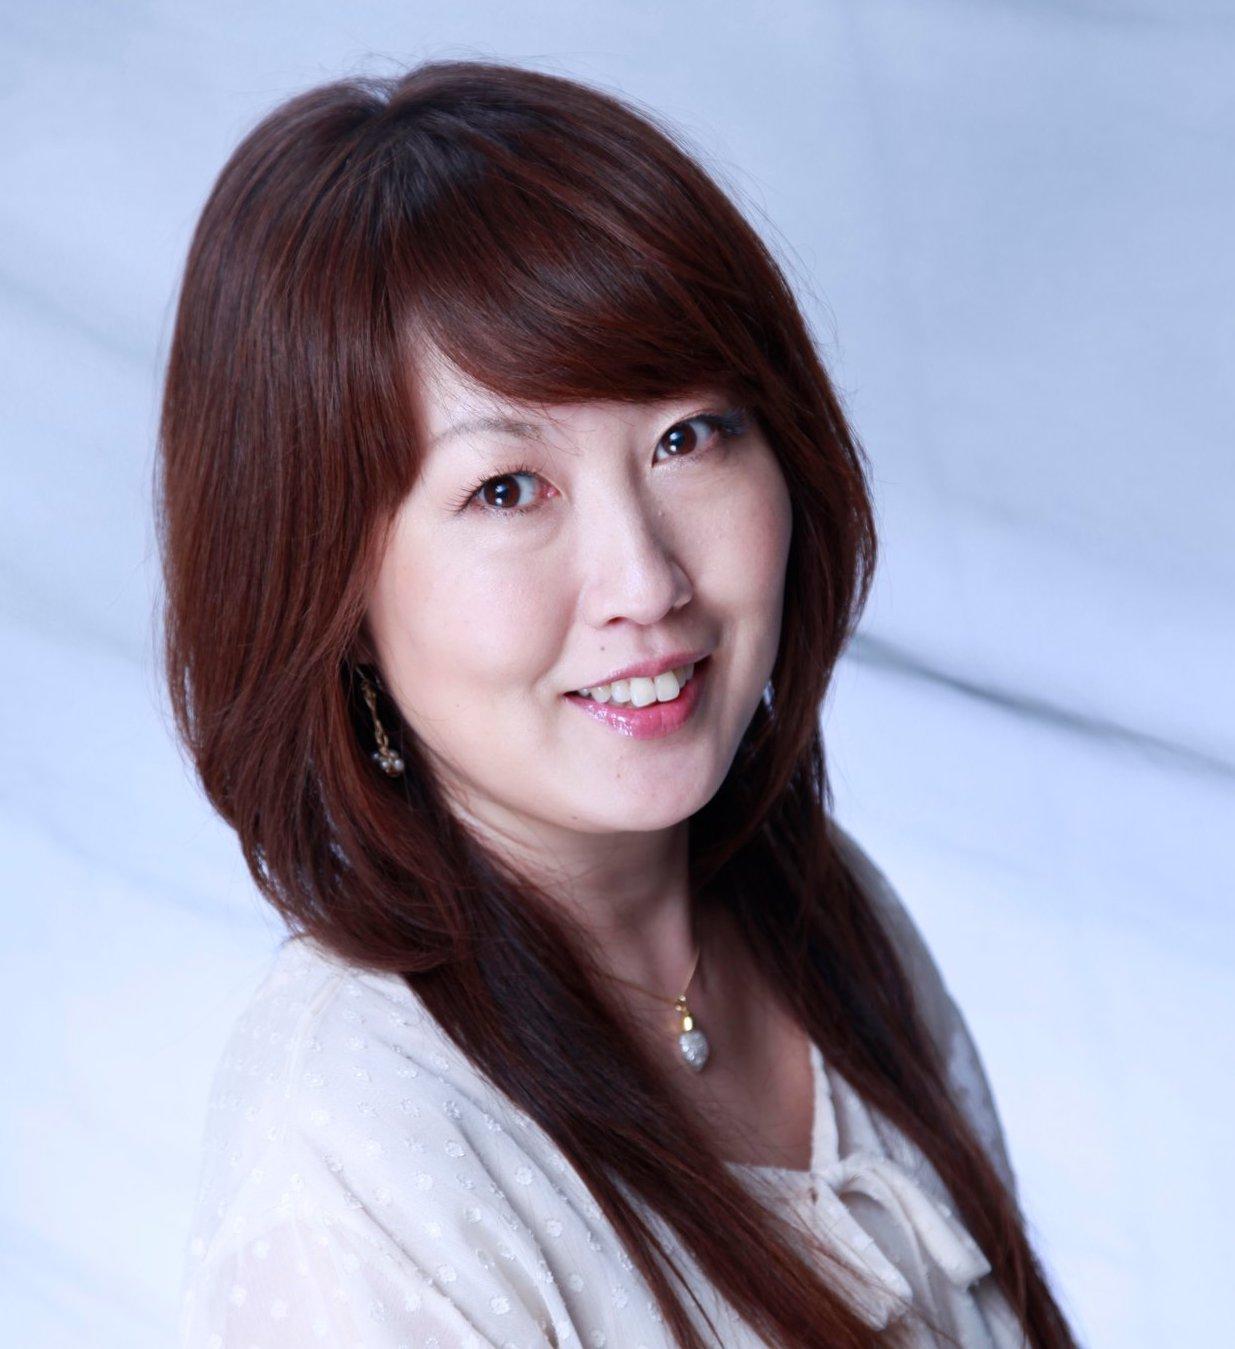 Eiko Kanamoto - easemethod@gmail.com